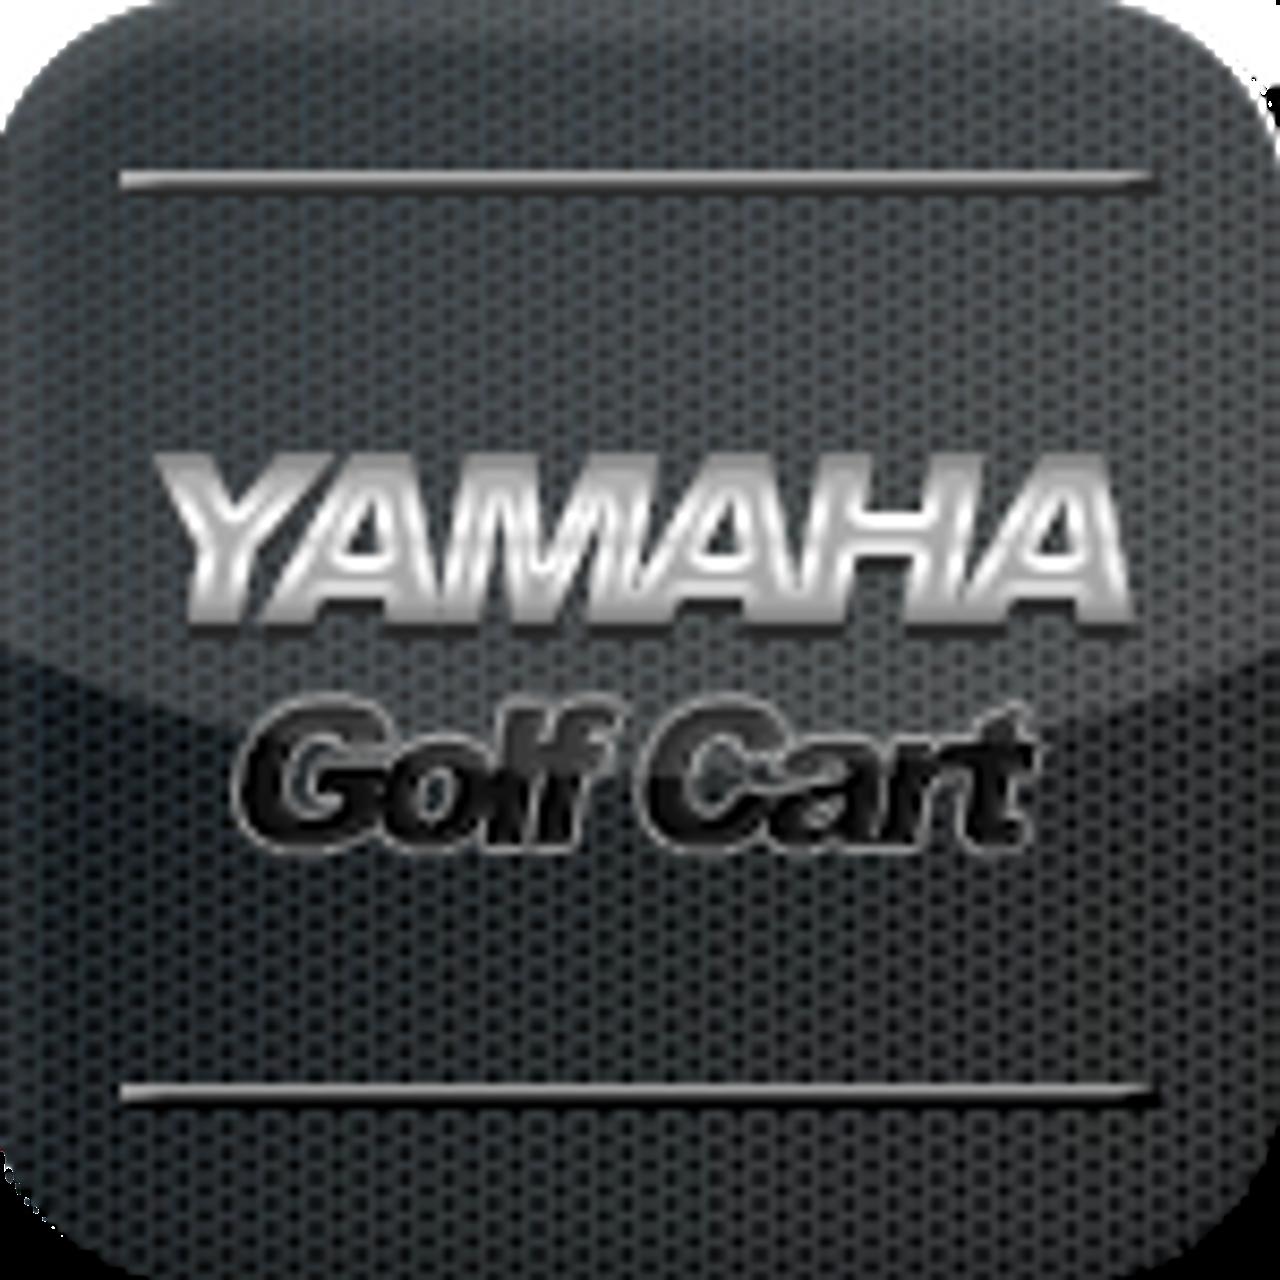 Yamaha Body and Trim